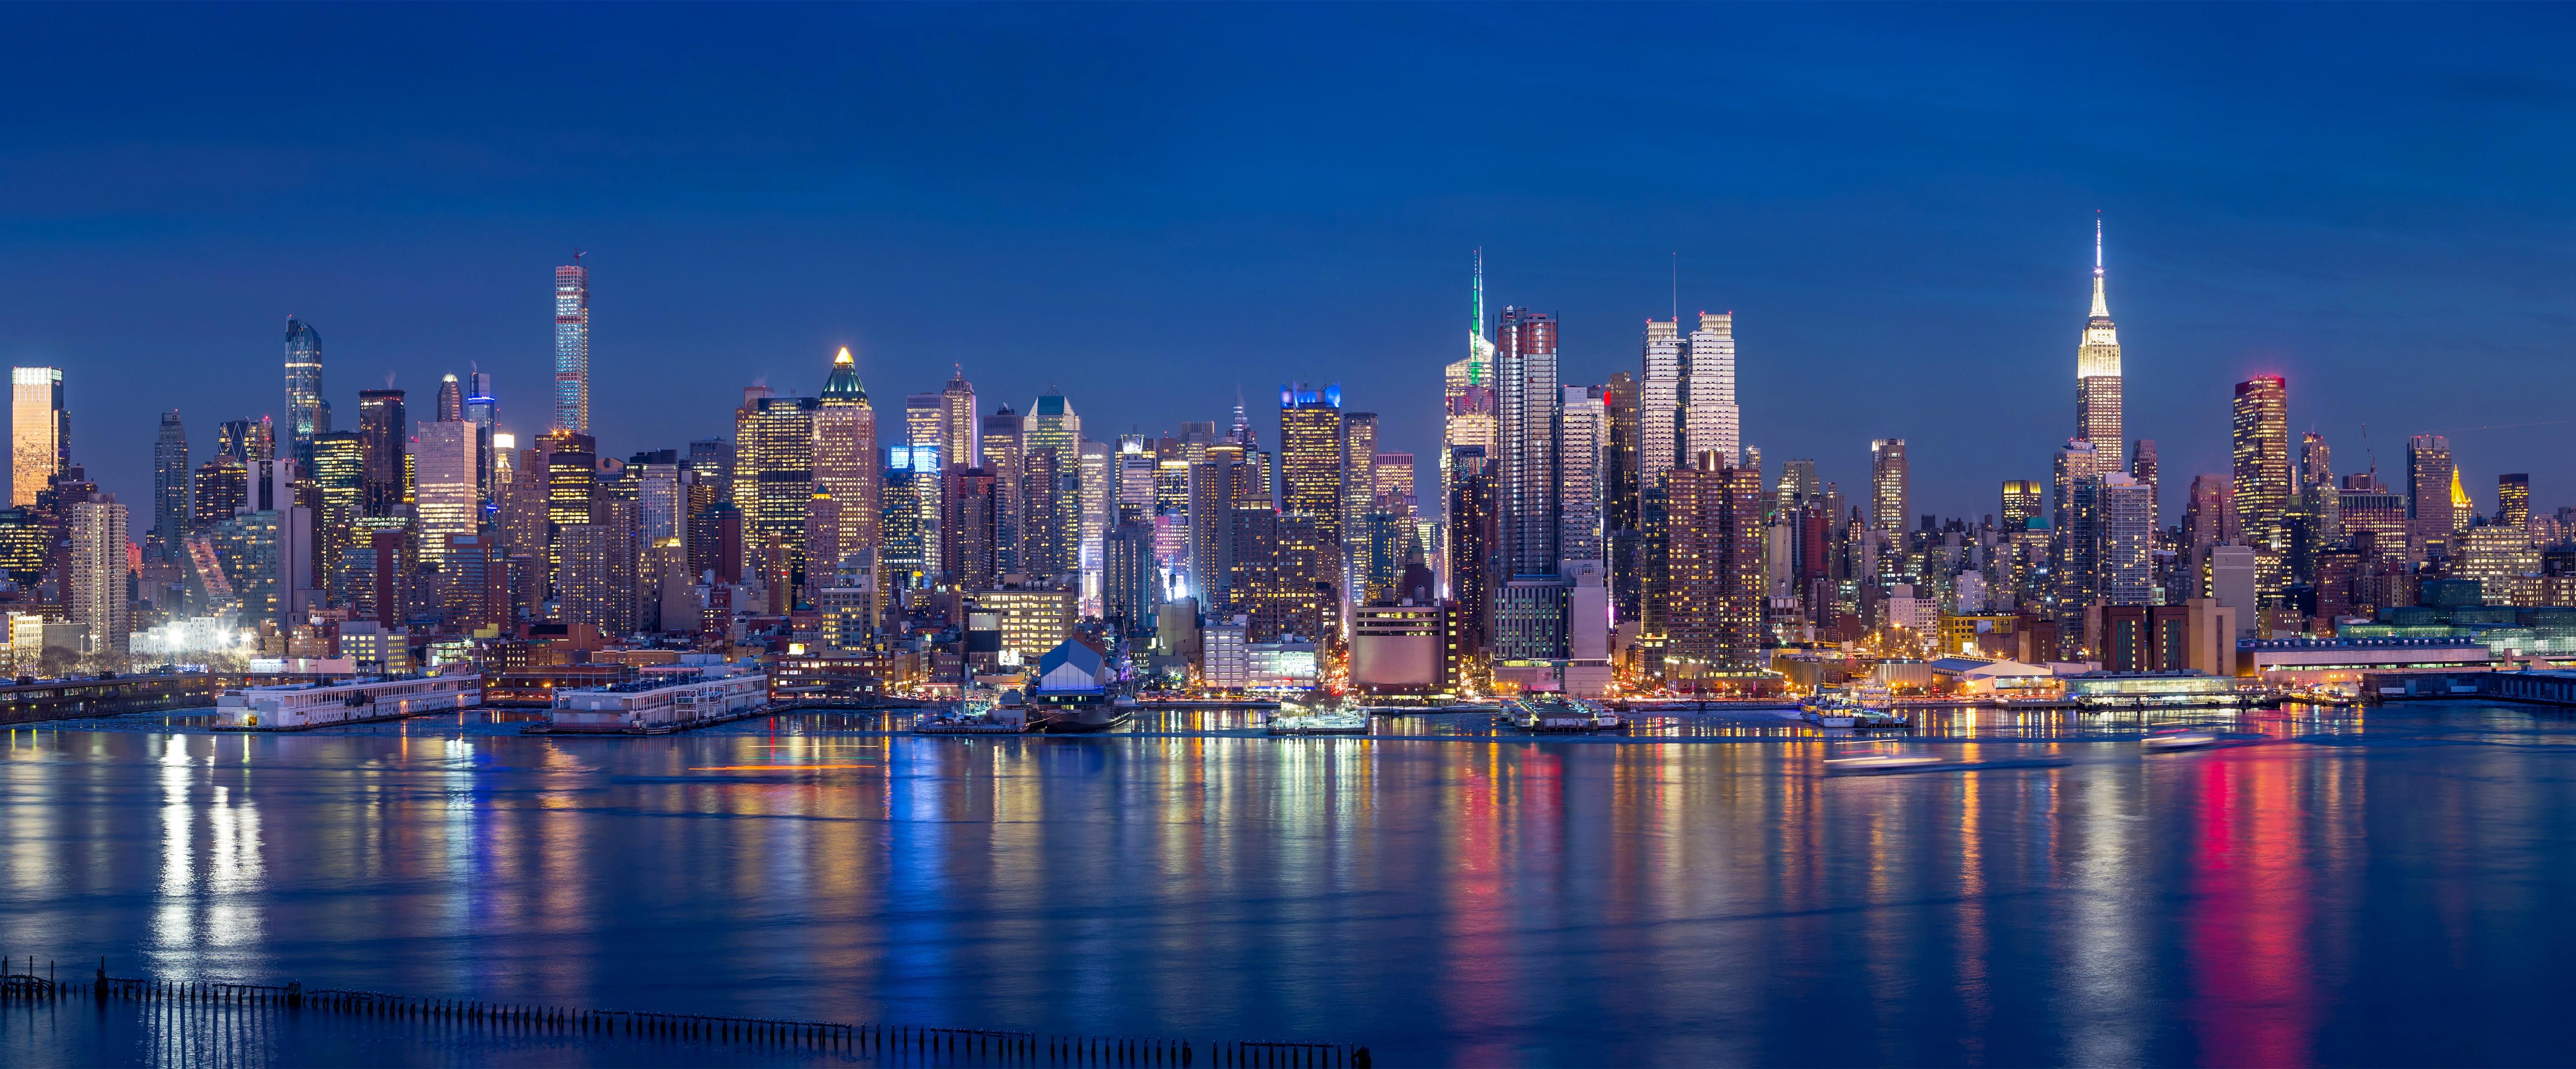 New York 4k Ultra Fond Décran Hd Arrière Plan 5540x2300